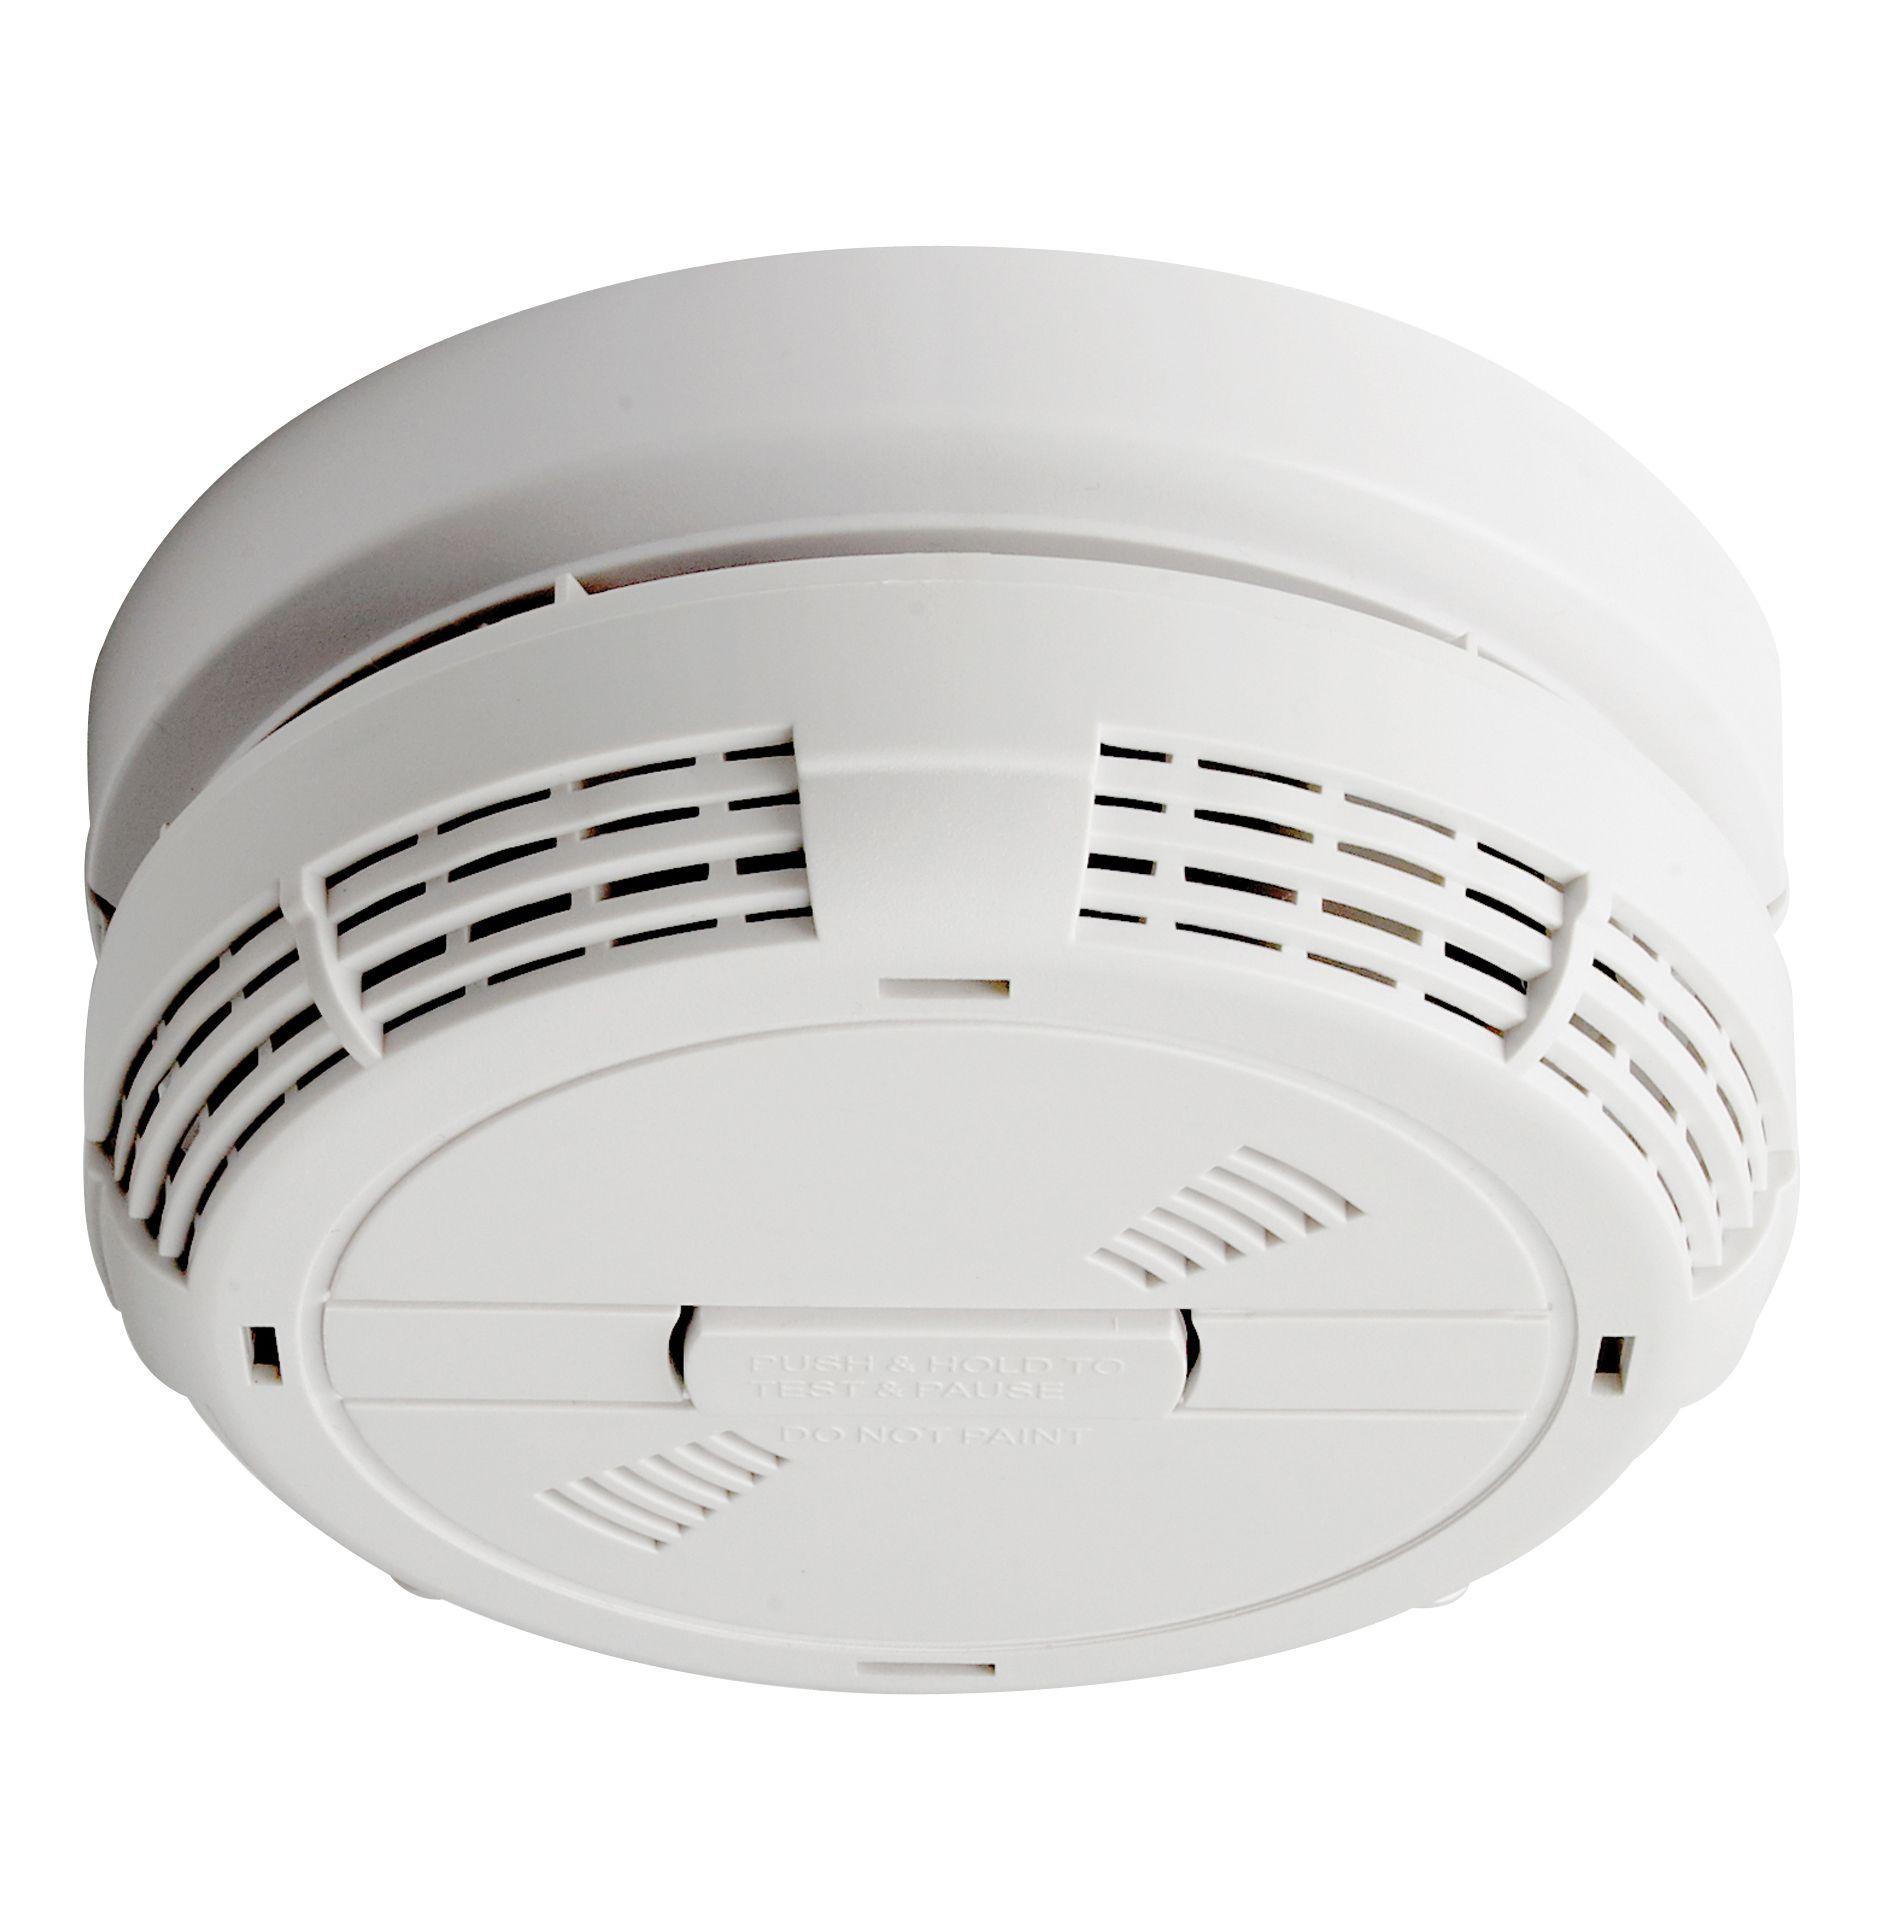 Fireangel Optical Mains Powered Smoke Alarm